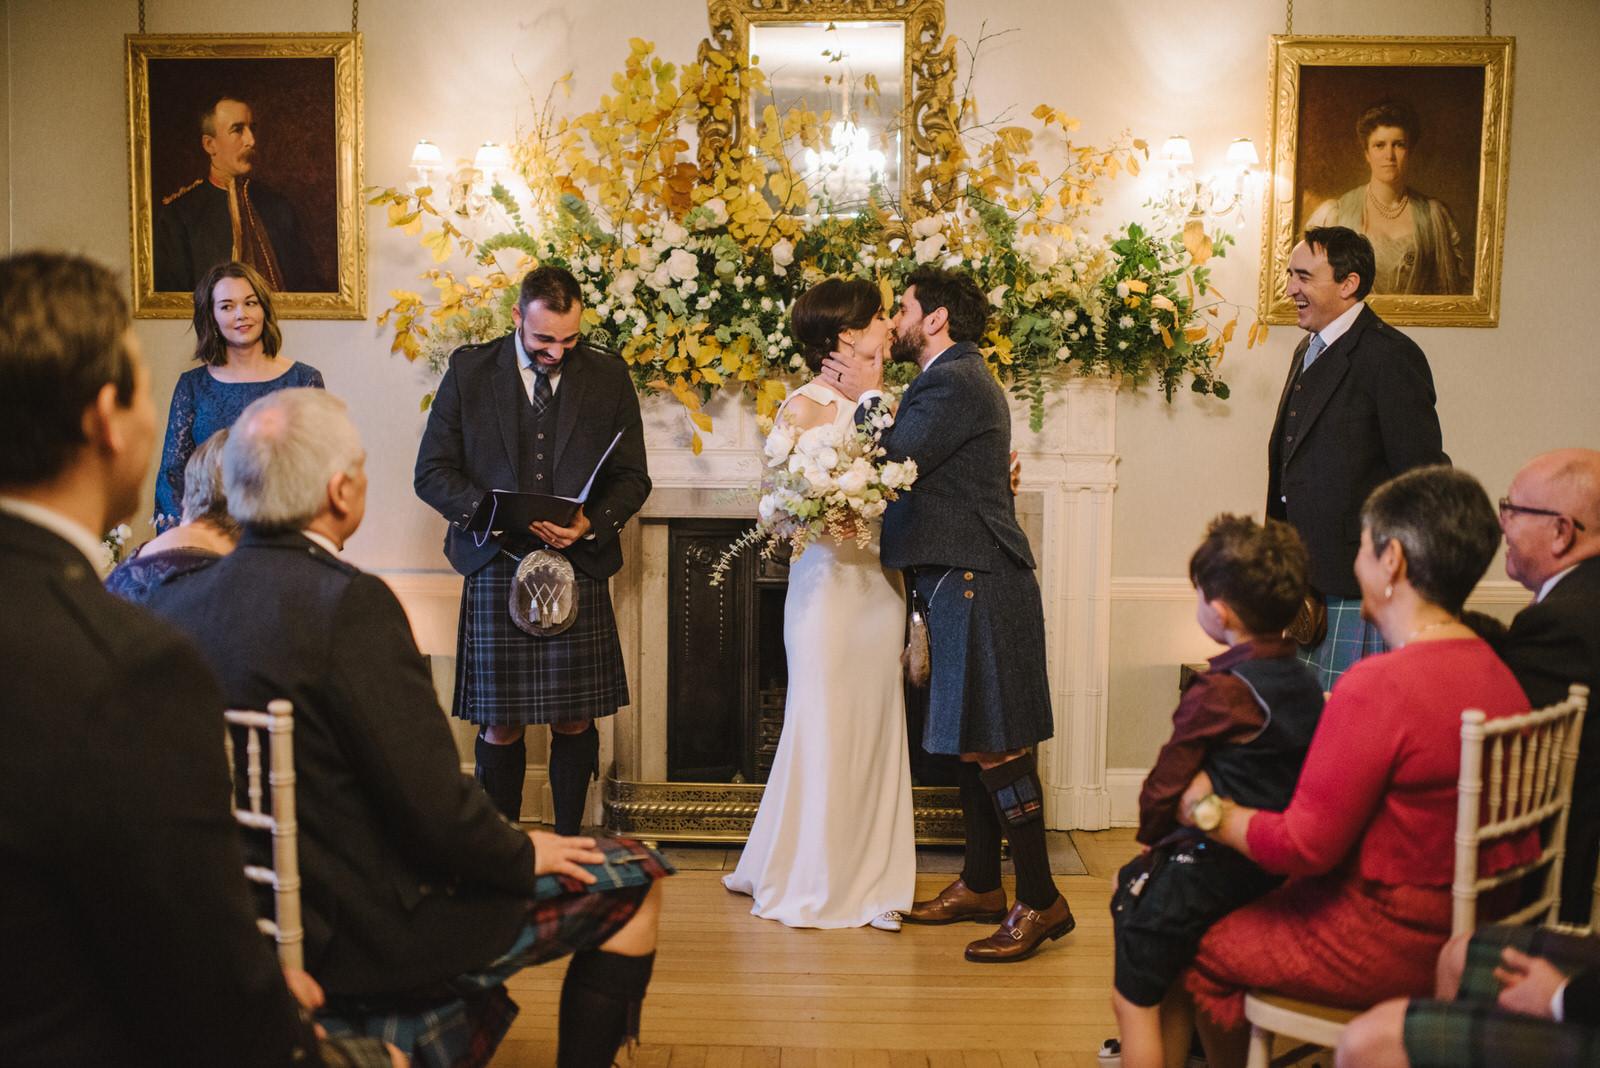 033-COLSTOUN-HOUSE-WEDDING-ALTERNATIVE-WEDDING-PHOTOGRAPHER-GLASGOW-WEDDING-PHOTOGRAPHER-STYLISH-SCOTTISH-WEDDING.JPG